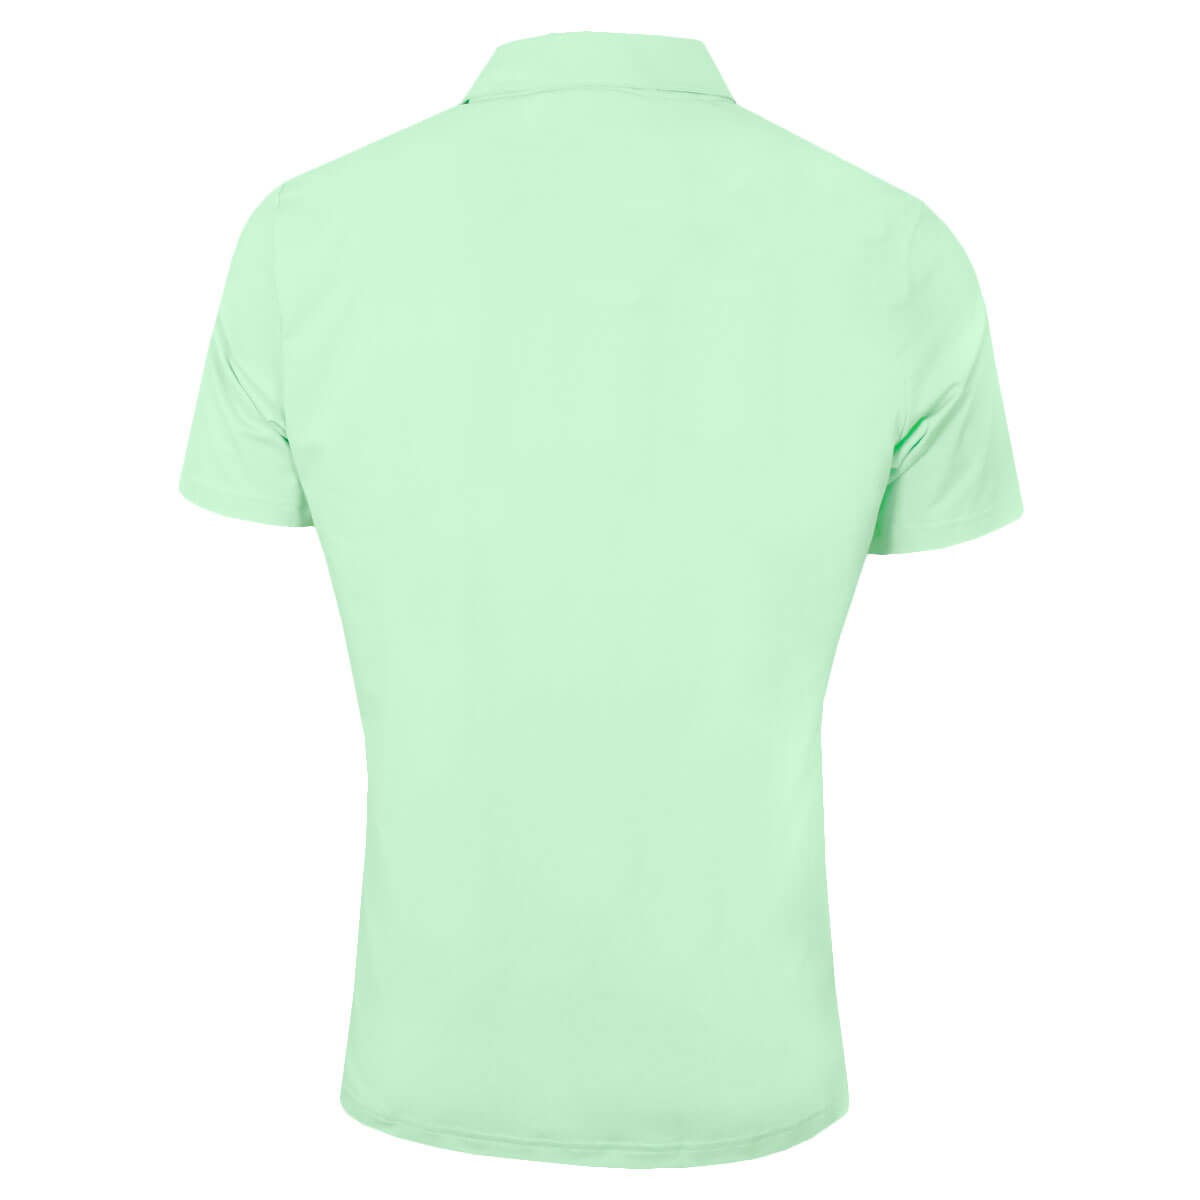 Adidas-Golf-Men-039-s-Ultimate-2-0-Solid-Crestable-Polo-Shirt thumbnail 11